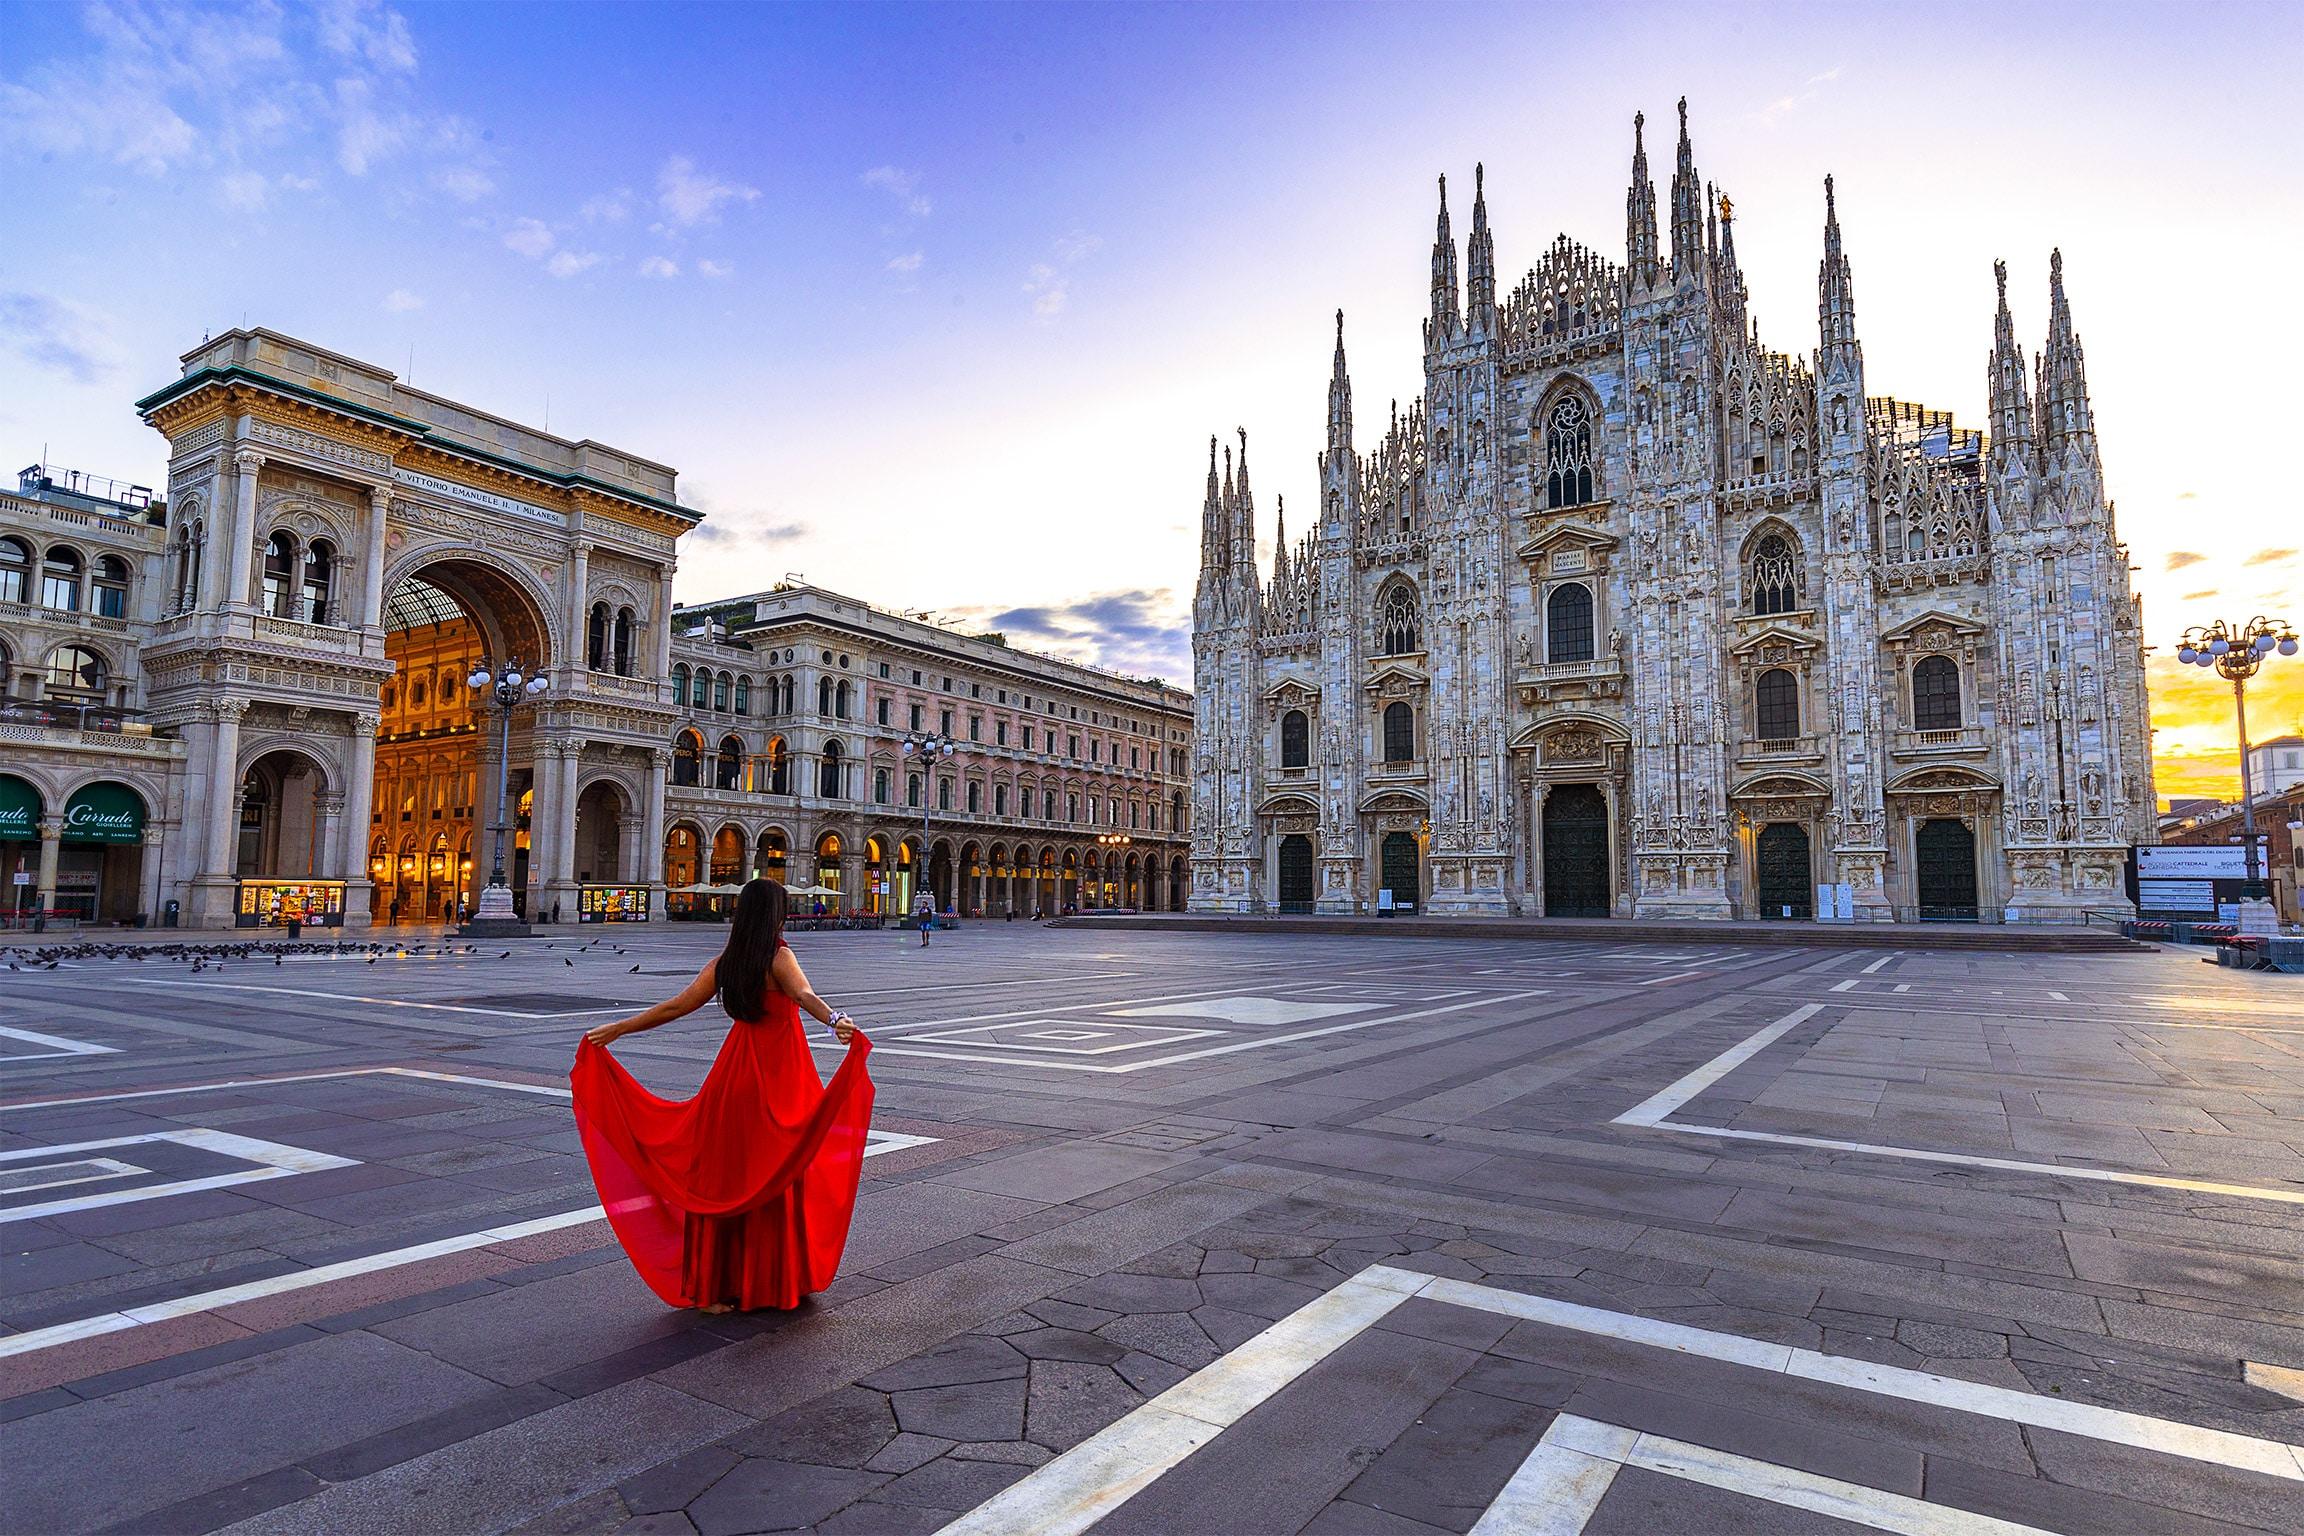 Duomo's Square